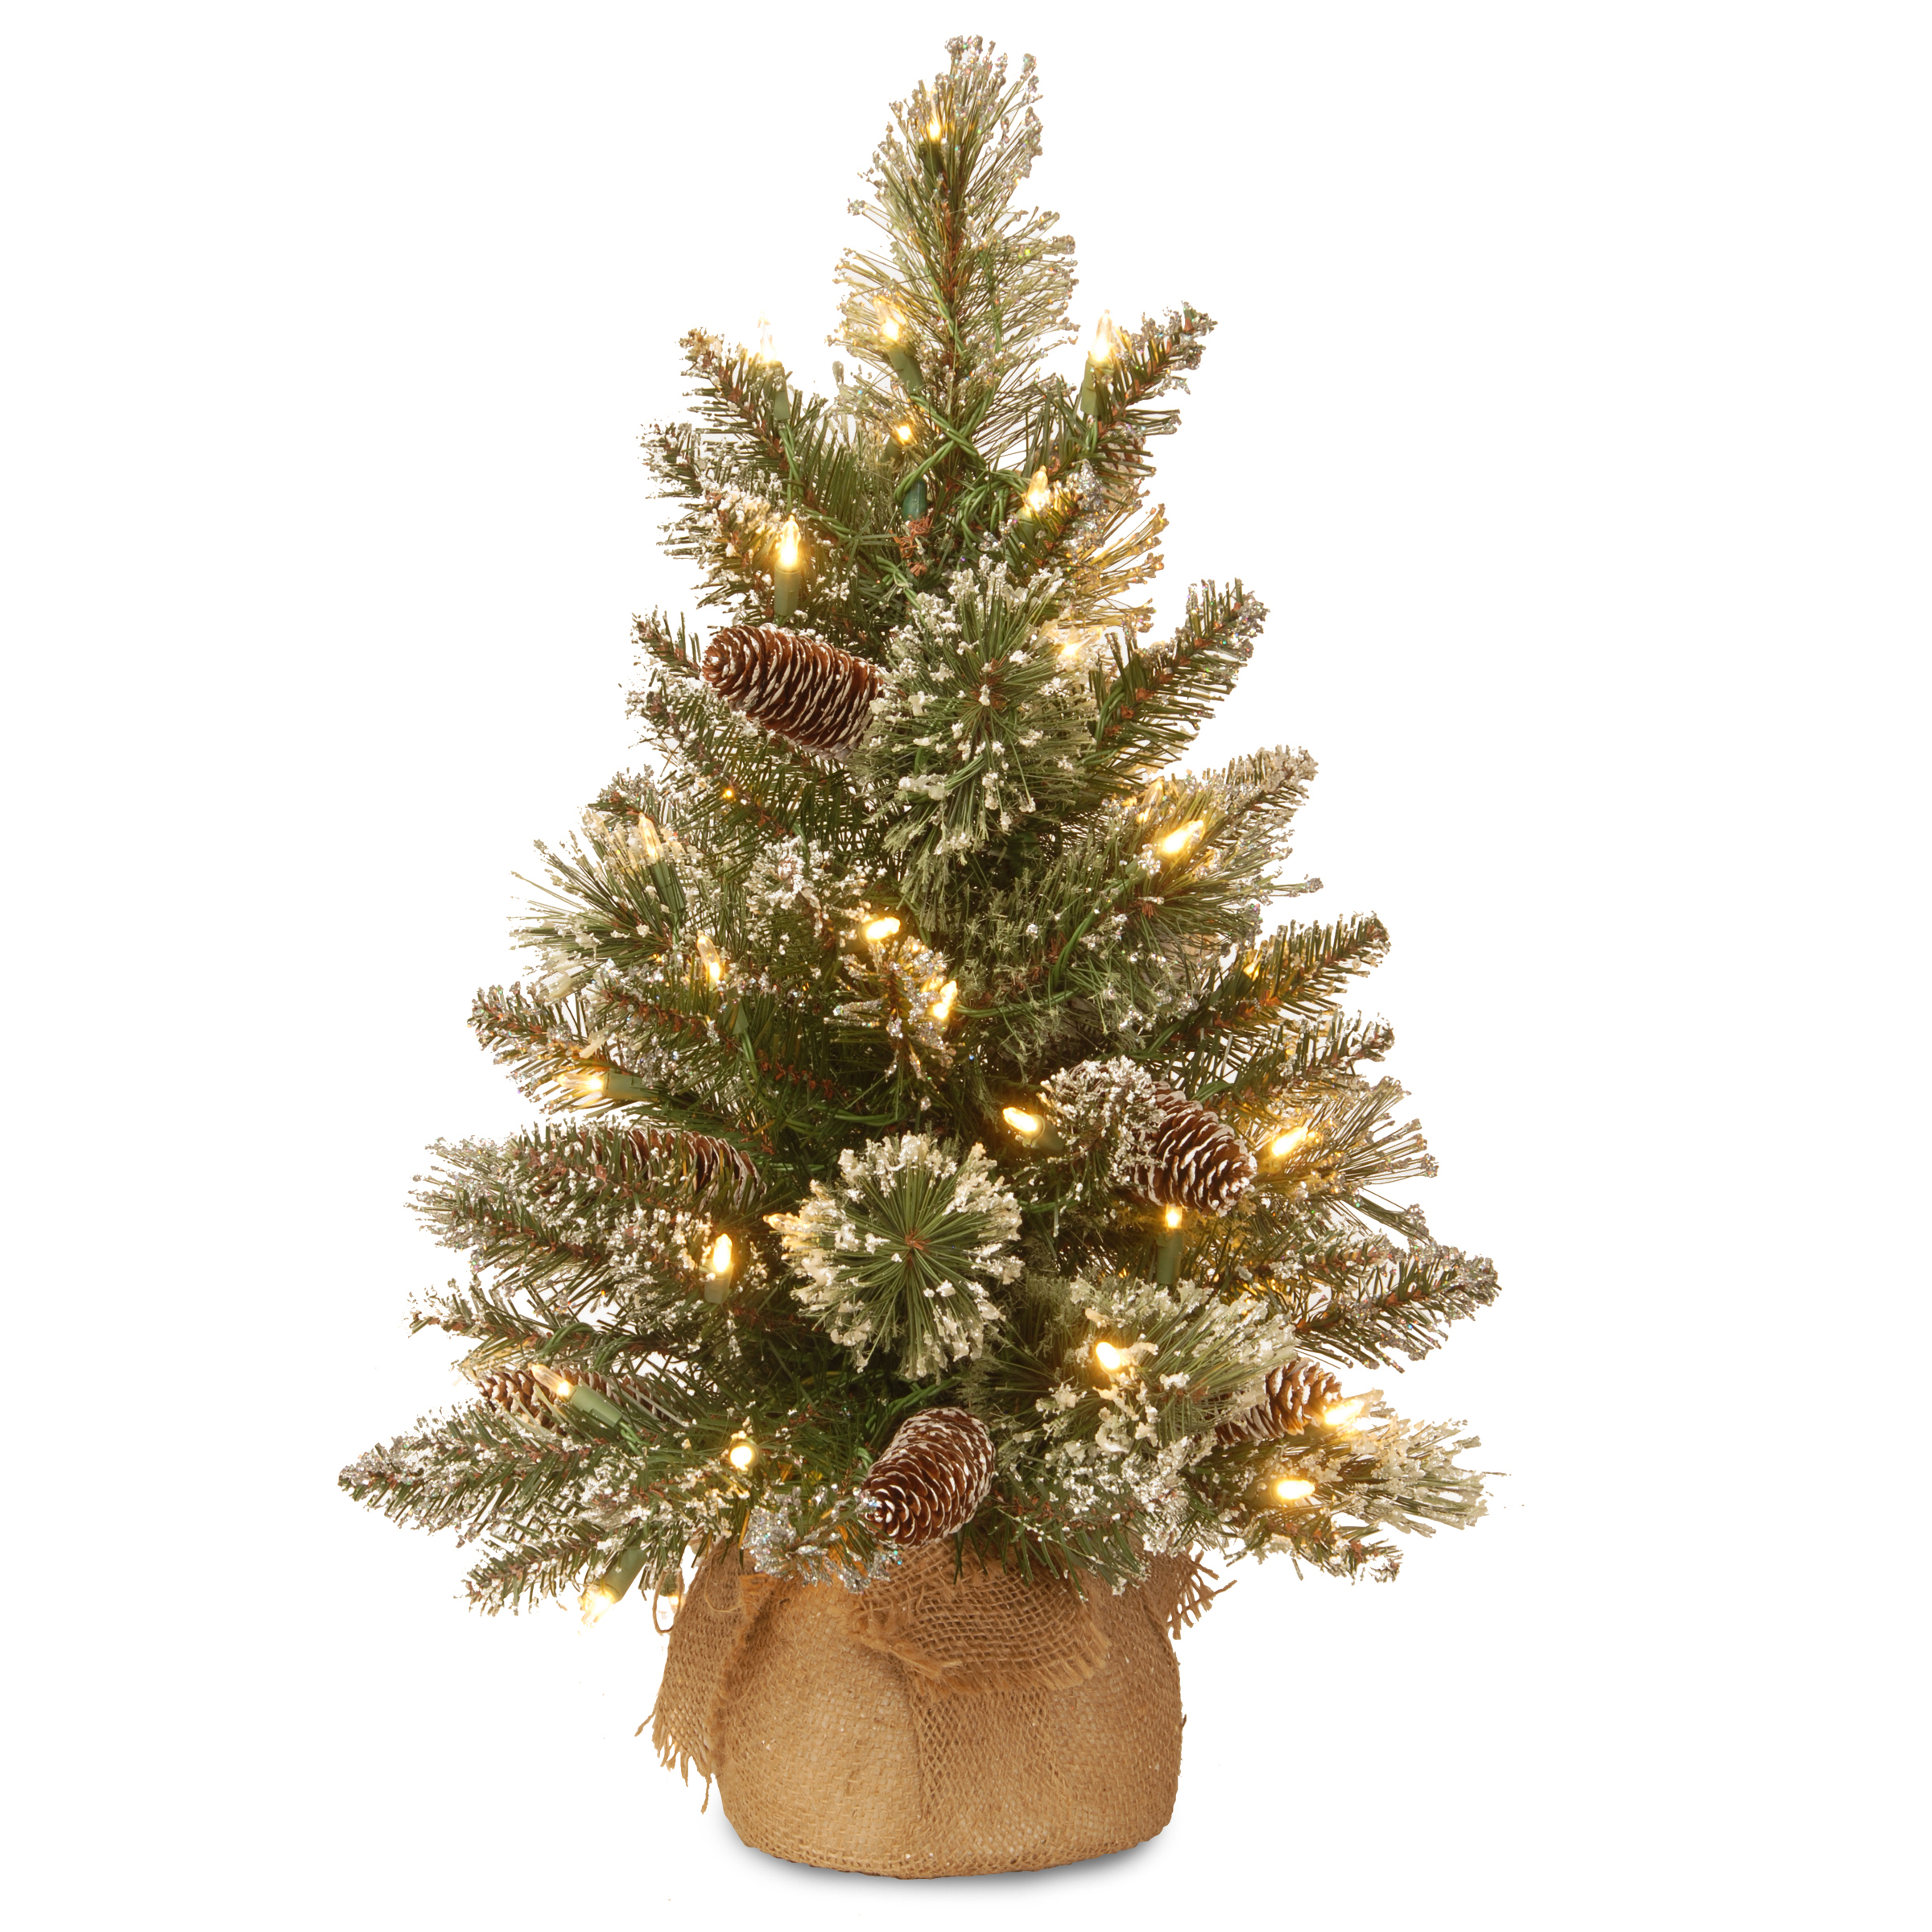 National Tree Company 2Ft Glittery Bristle Pine Burlap Tree With LED Lights